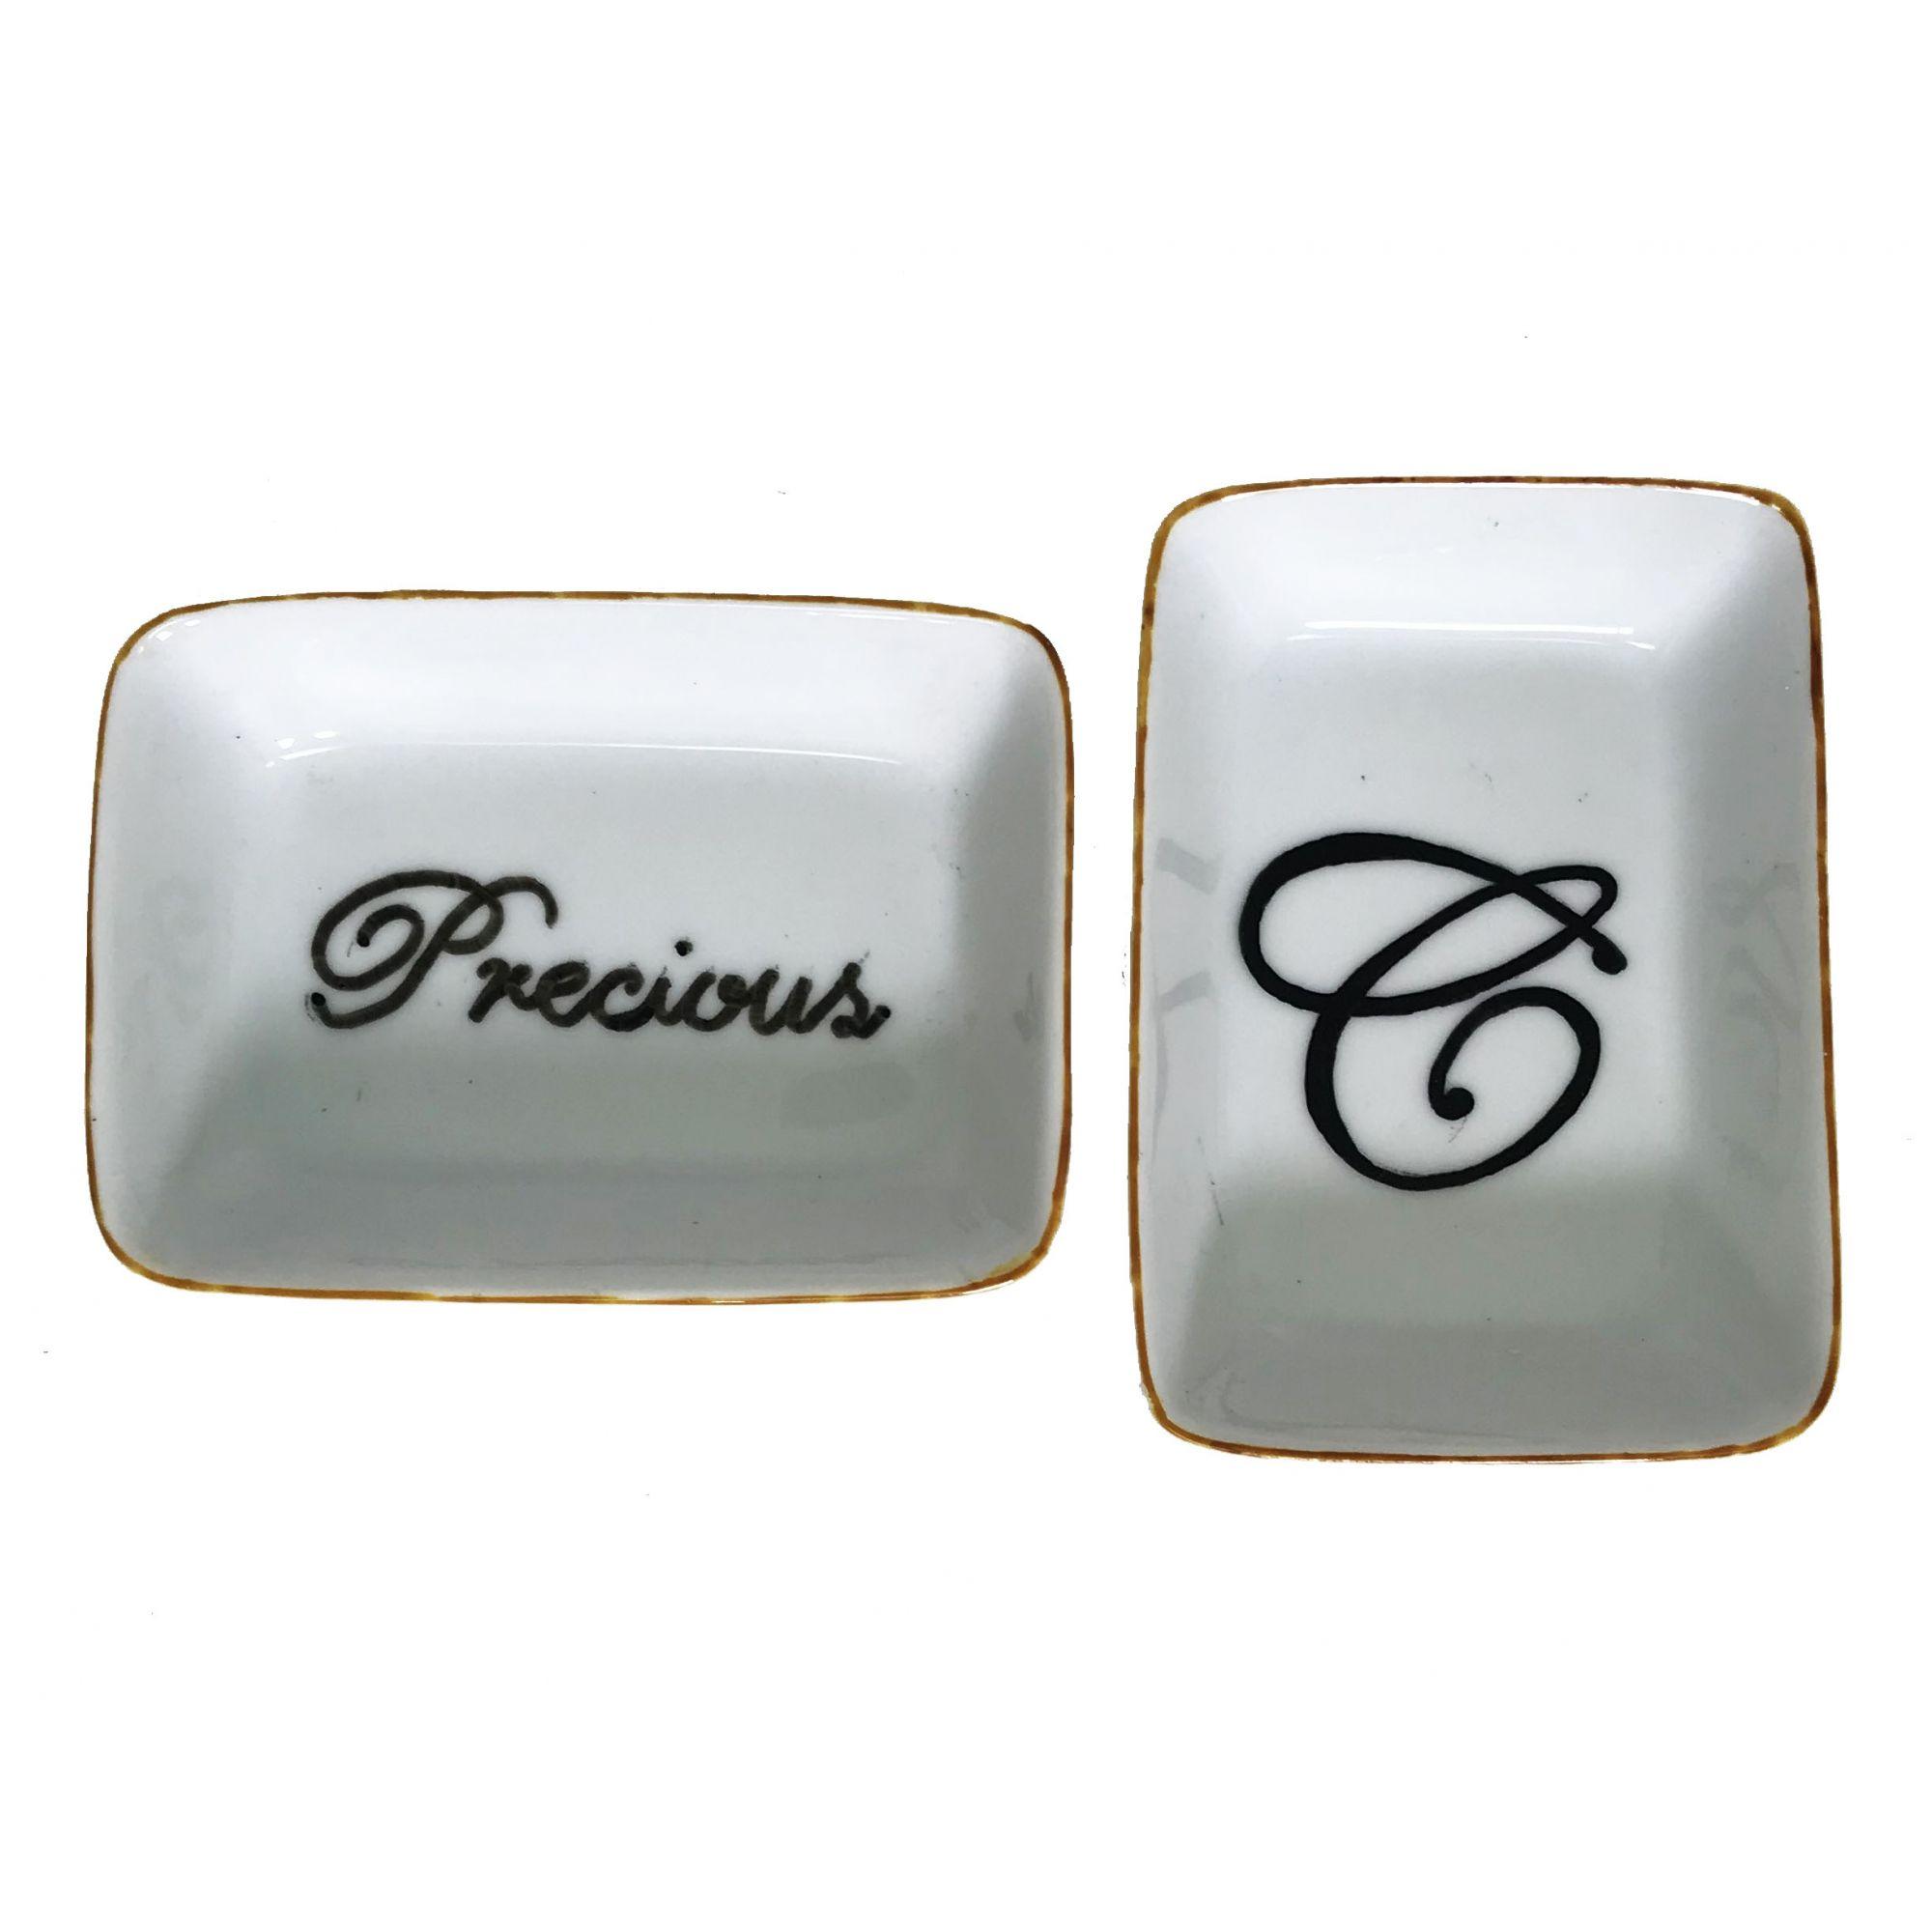 - Prato multiuso - Precious e 1 letra personalizada preto, branco e dourado 2 unidades